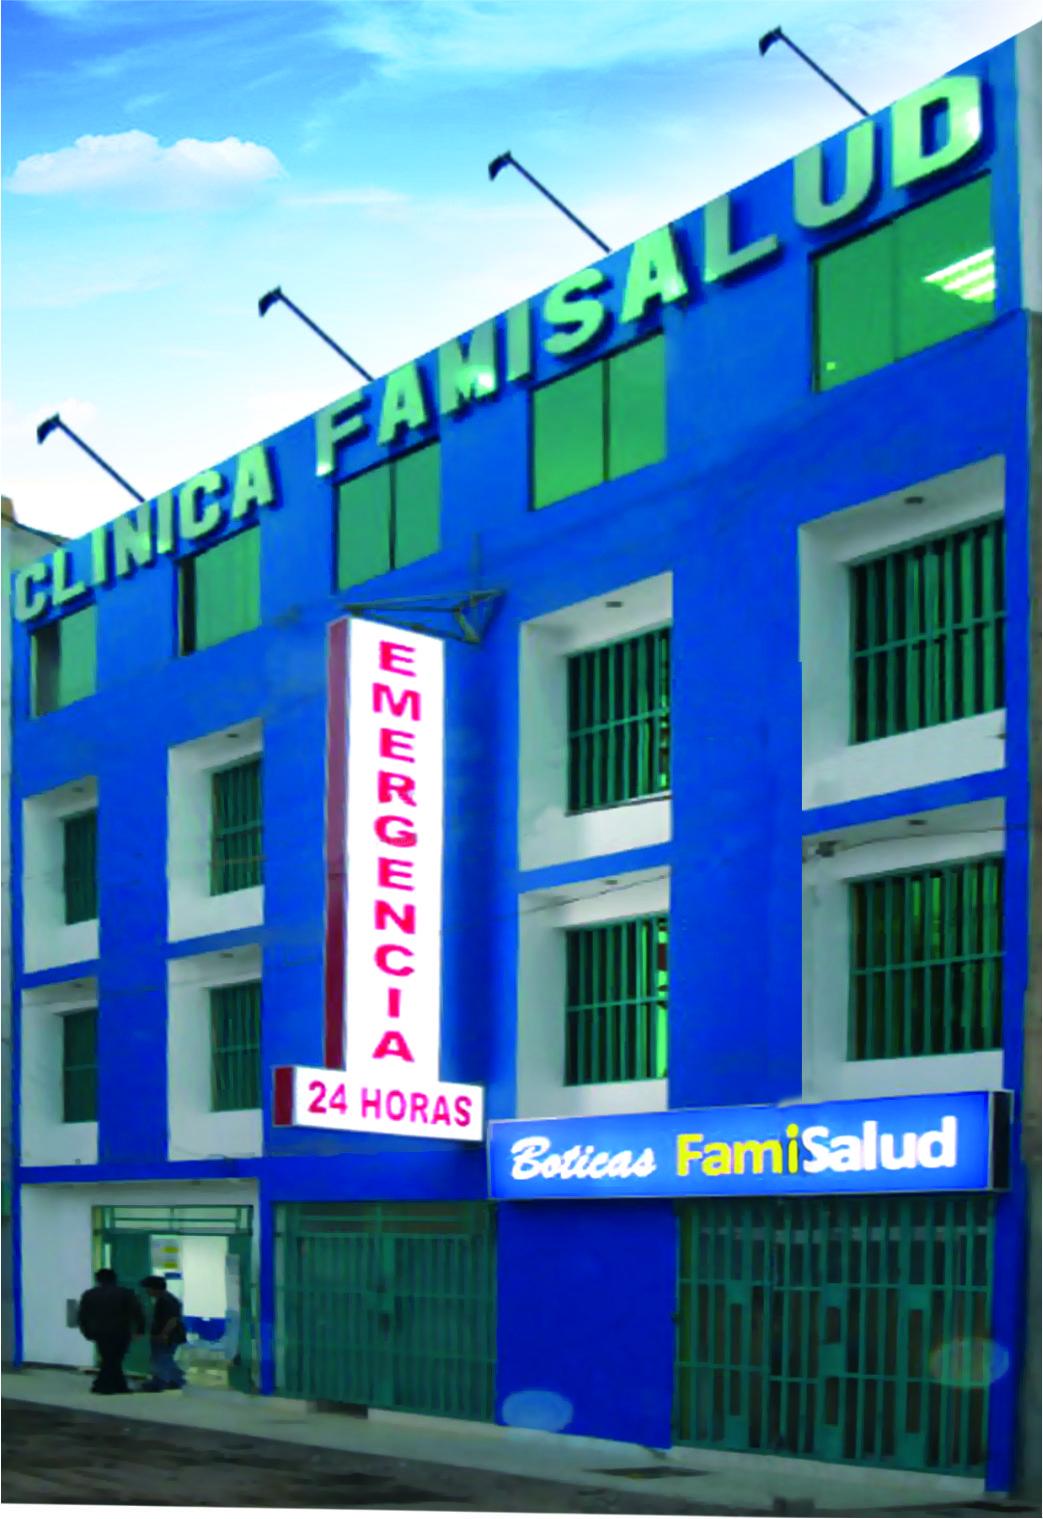 Clinica Famisalud Pisco # Muebles Para Consultorio Nutricional